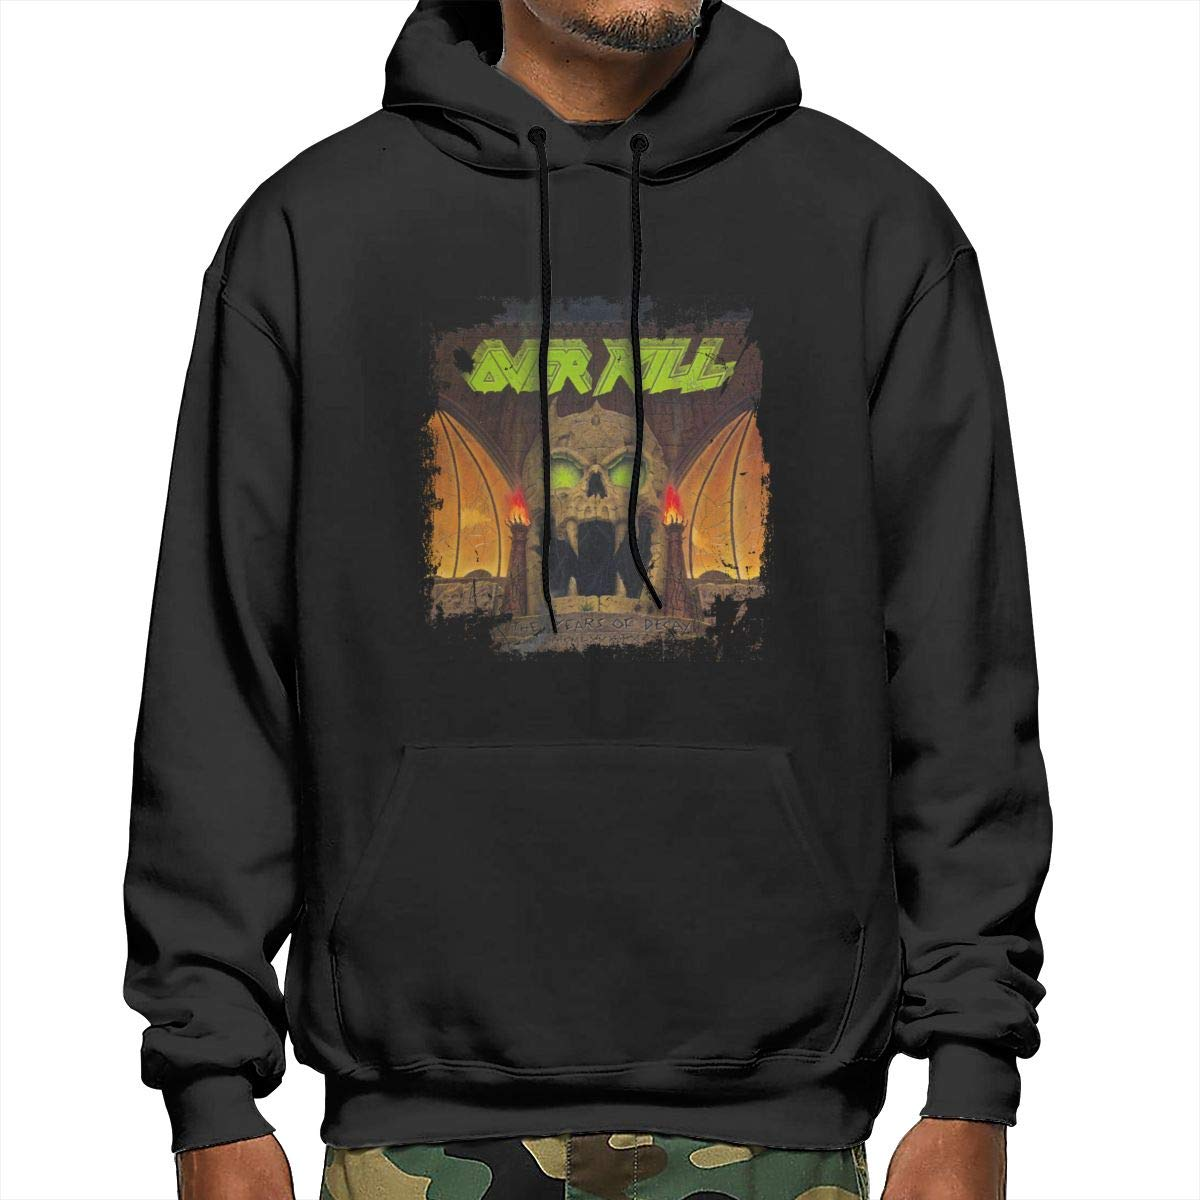 Opanjyajk Overkill The Years of Decay Mens Pullover Hooded Sweatshirt